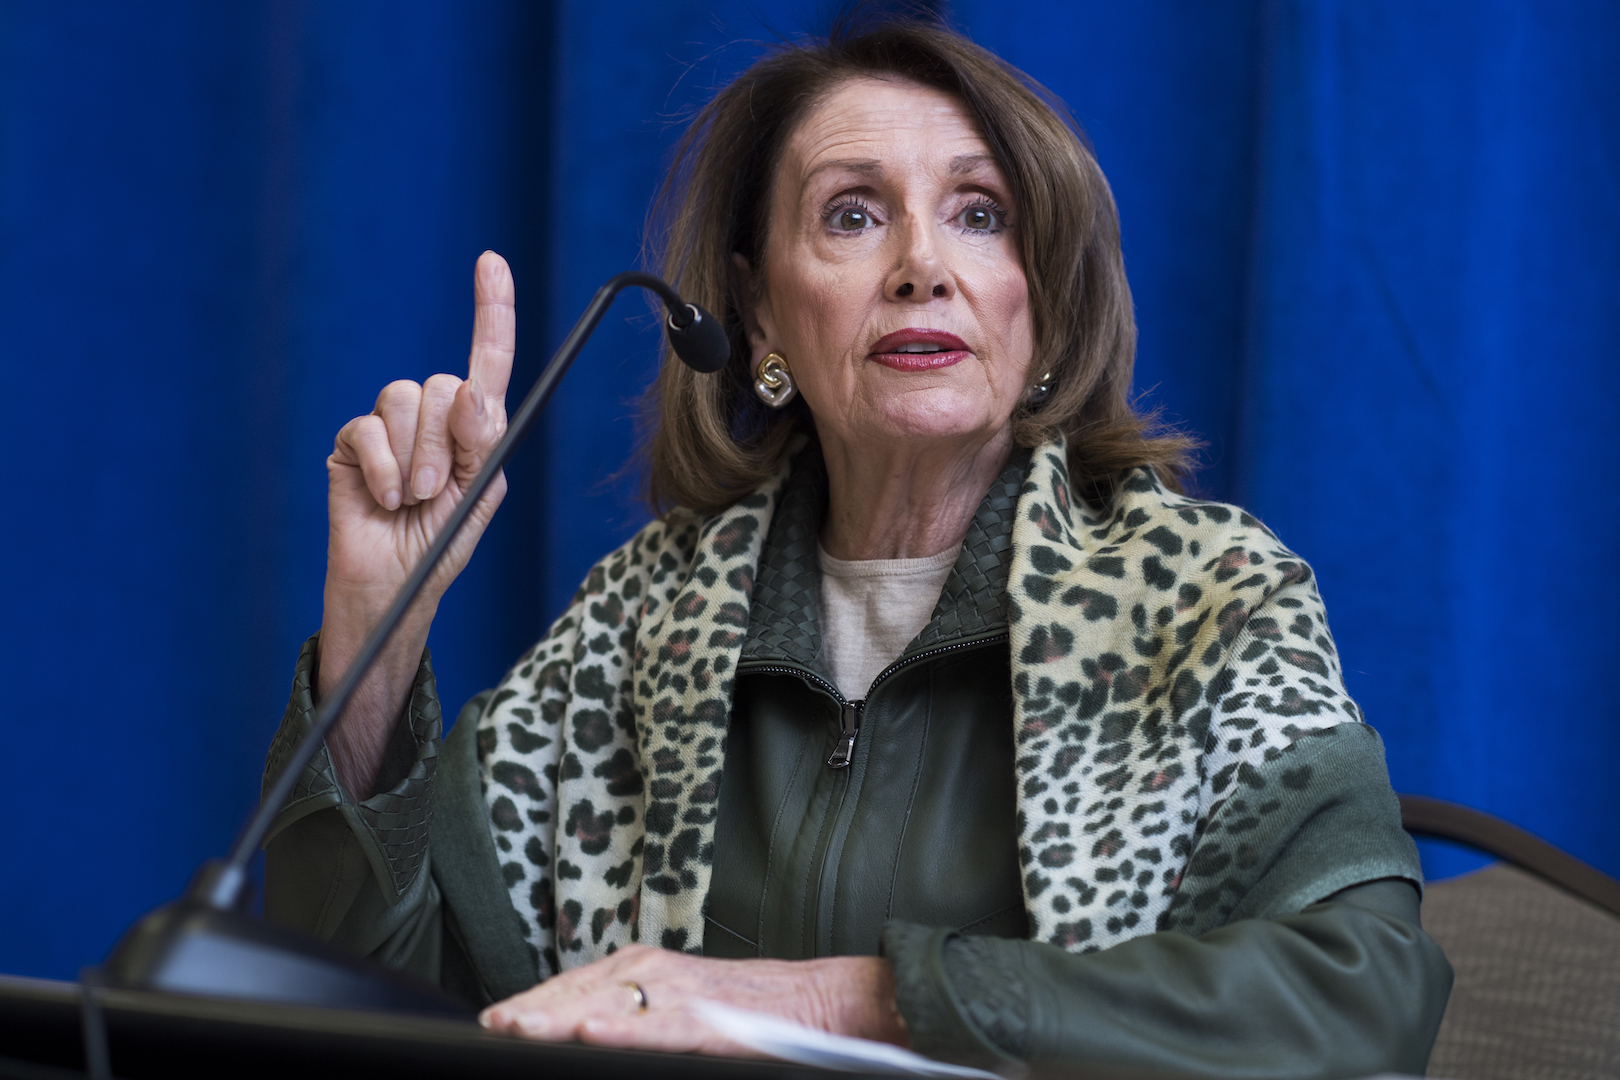 Democrats on impeaching Trump: ¯\_(ツ)_/¯